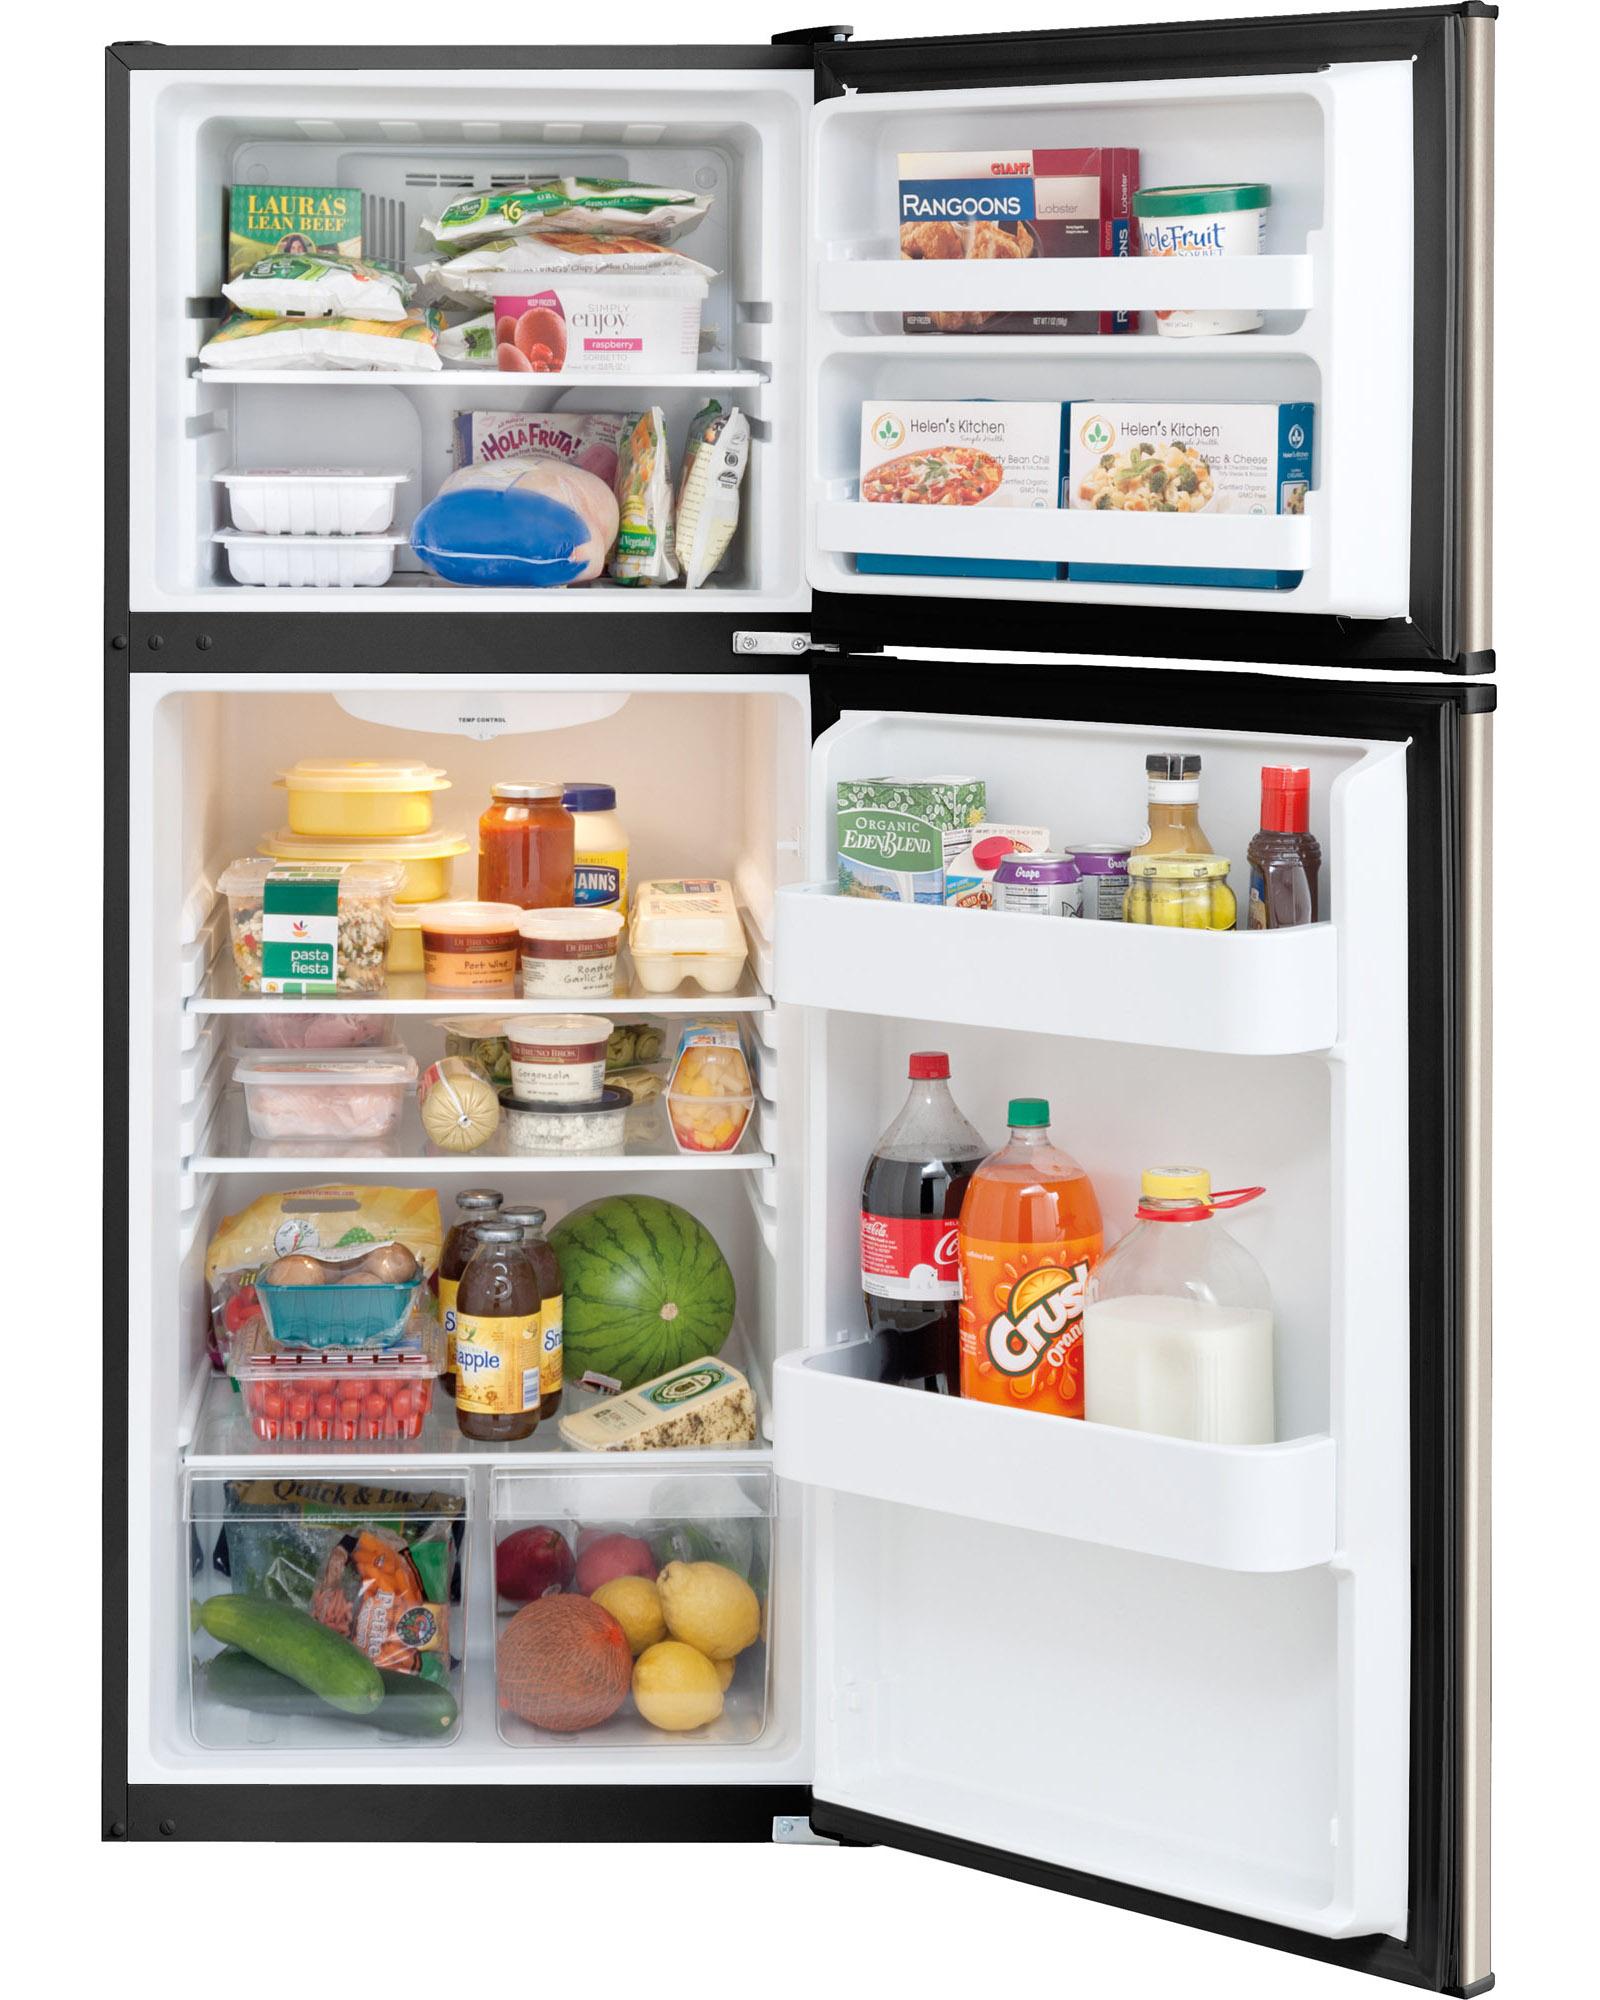 Frigidaire FFTR1022QM 10 cu. ft. Top Freezer Refrigerator - Silver Mist